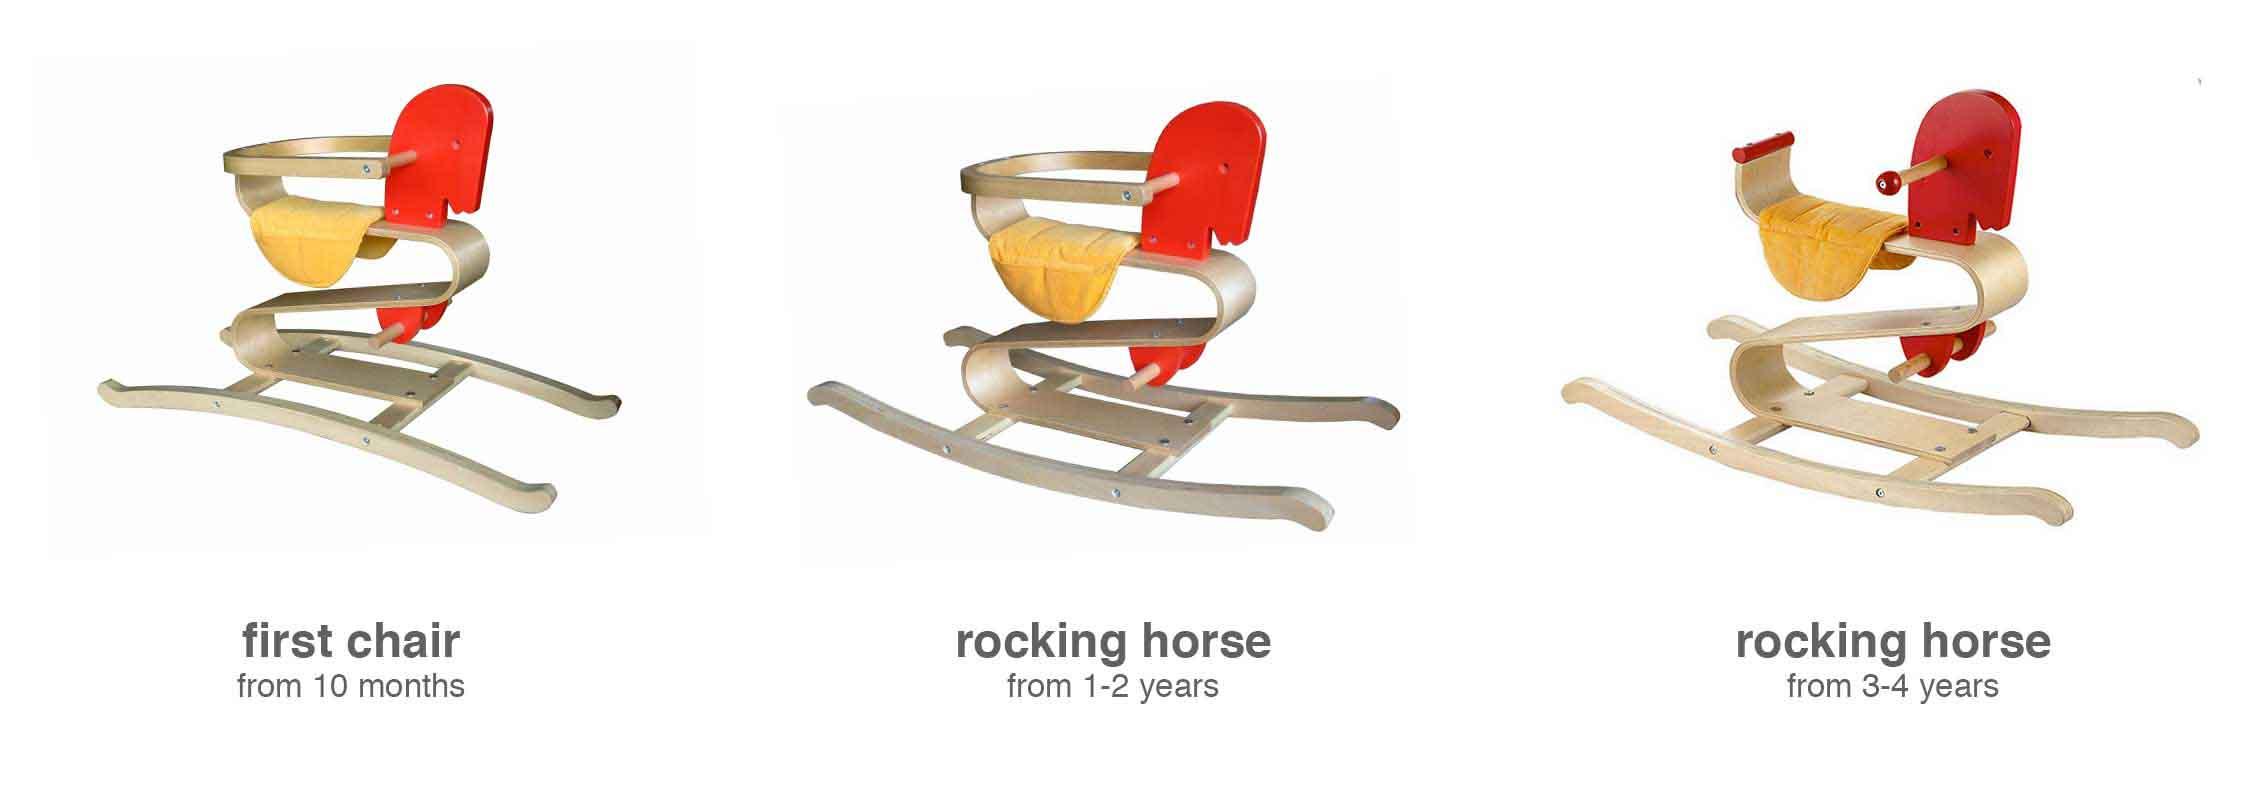 icaro-multi-layered-wooden-innovative-rocking-horse